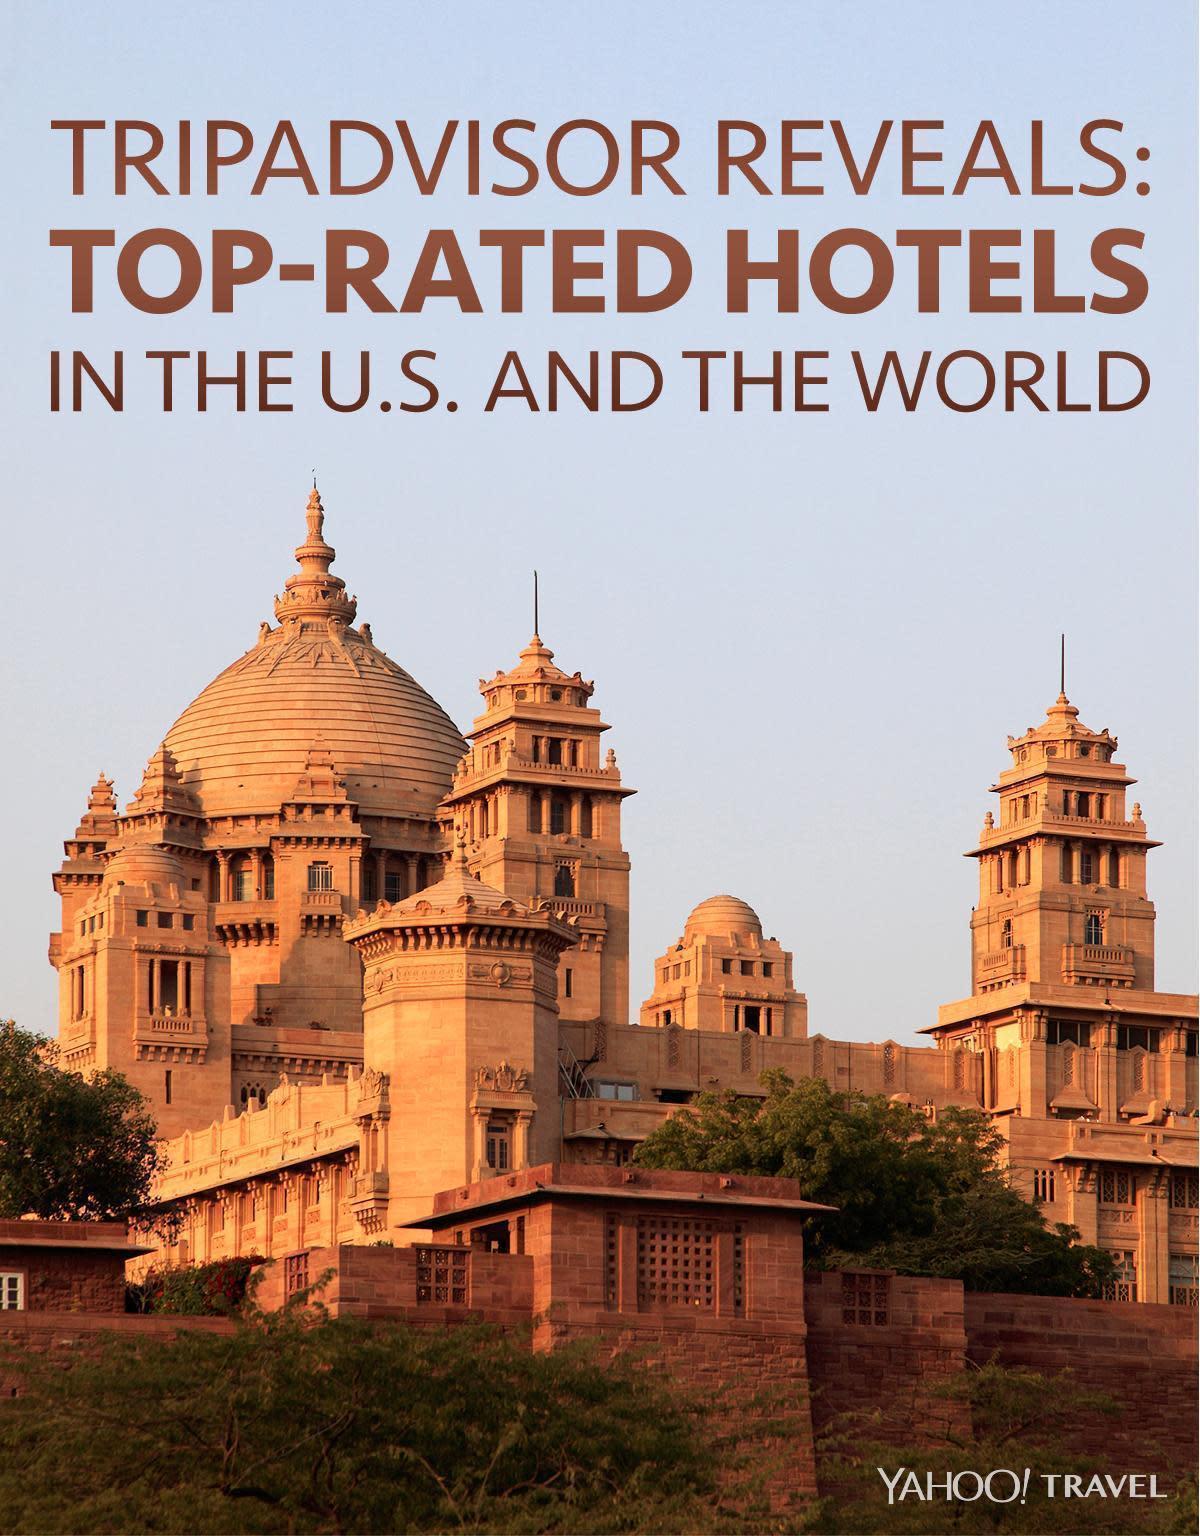 Umaid Bhawan Palace To Mirihi Island Resort World S Top 10 Hotels According Tripadvisor Travelers